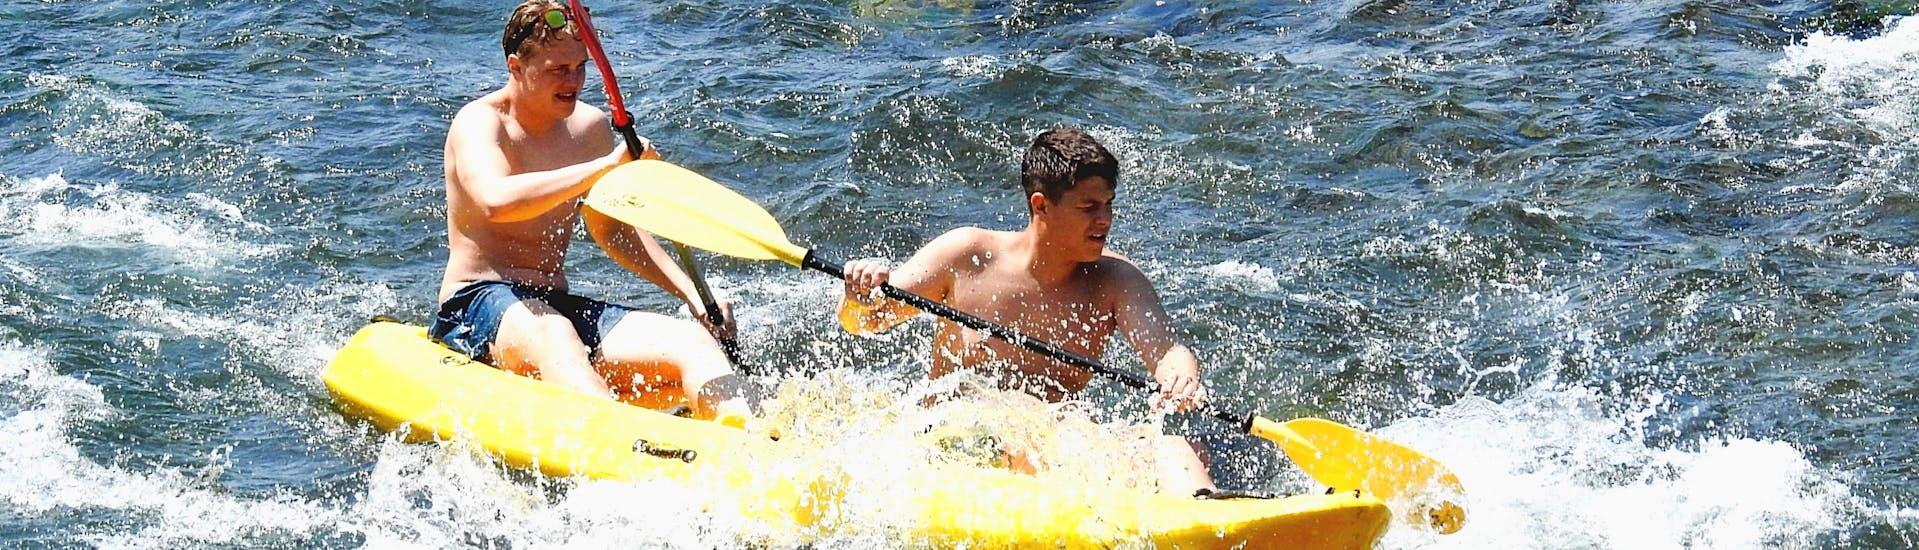 canoeing-kayaking-on-the-kupa-safari-bachelor-party-gorski-tok-rafting-hero